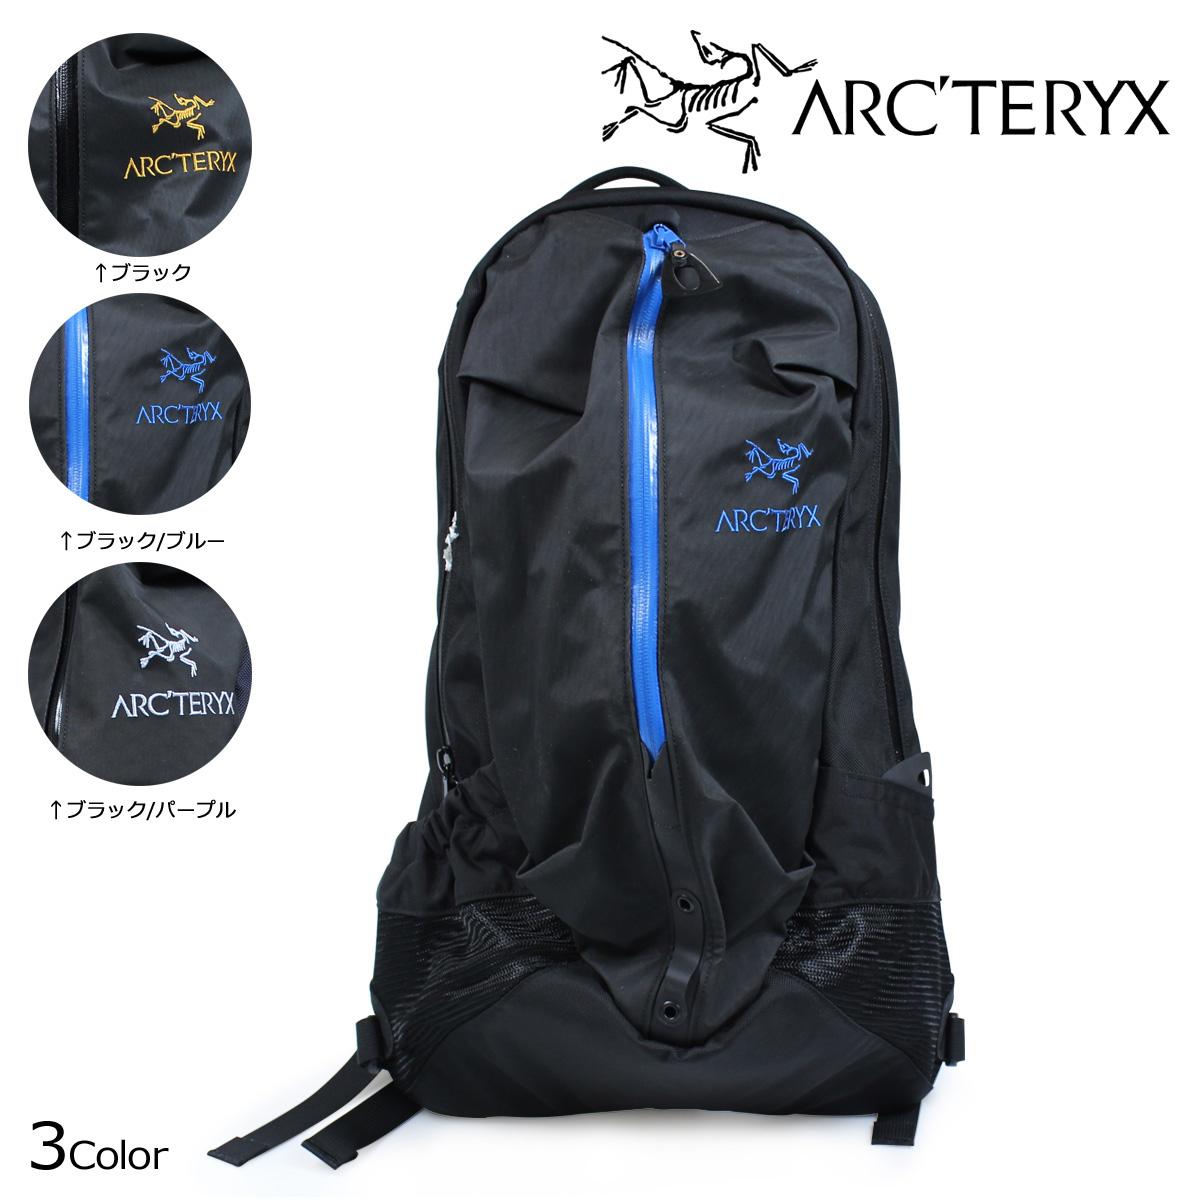 ARC'TERYX ARRO 22 BACKPACK アークテリクス リュック アロー22 バックパック 22L 6029 【決算セール 返品不可】